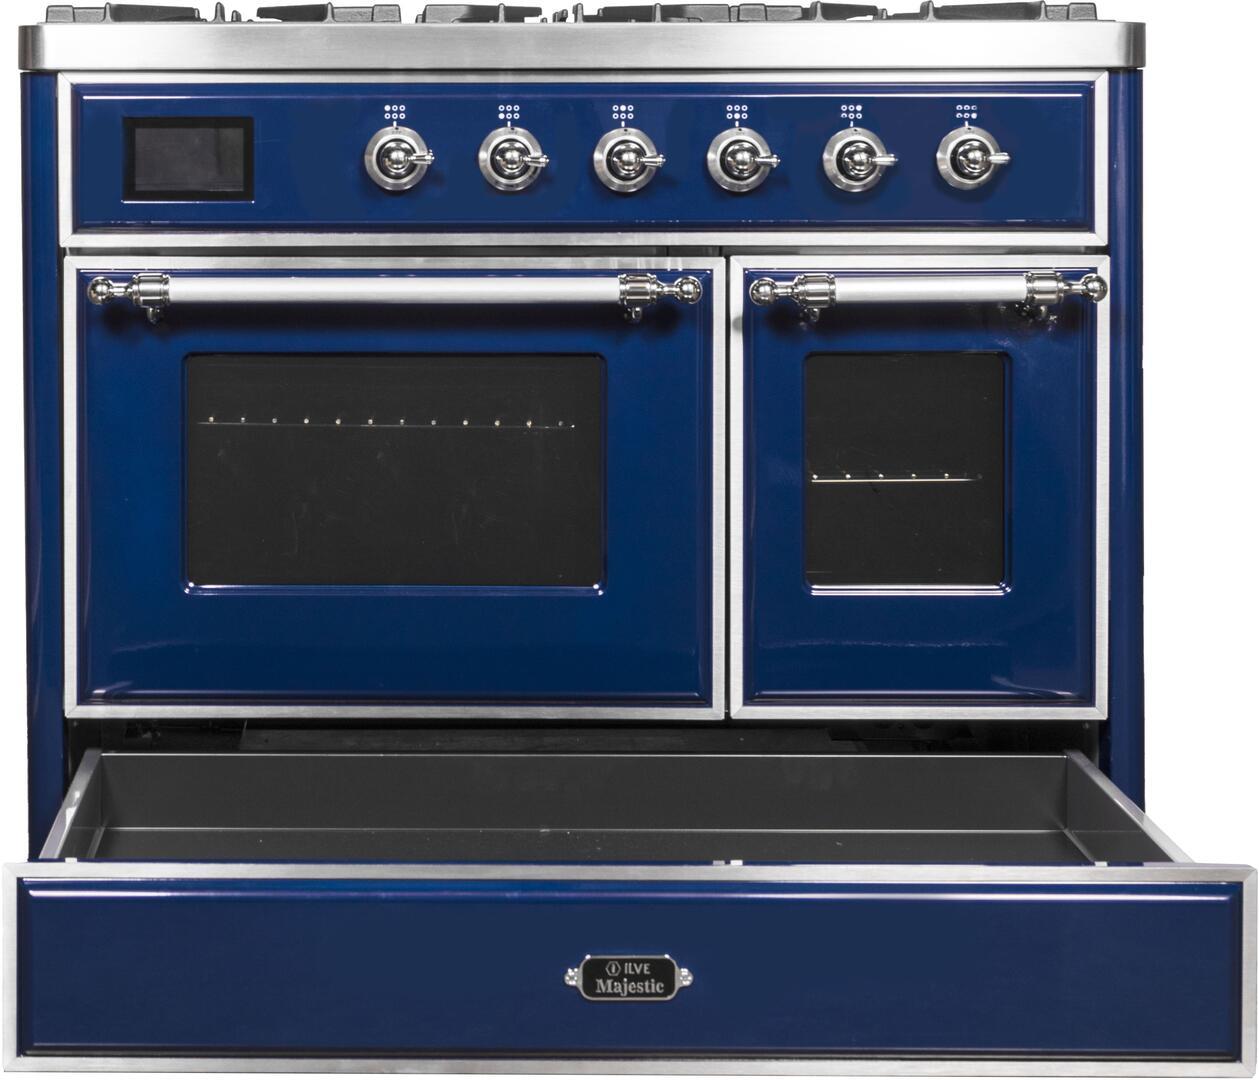 Ilve Majestic II UMD10FDNS3MBC Freestanding Dual Fuel Range Blue, UMD10FDNS3MBC Warming Drawer Opened